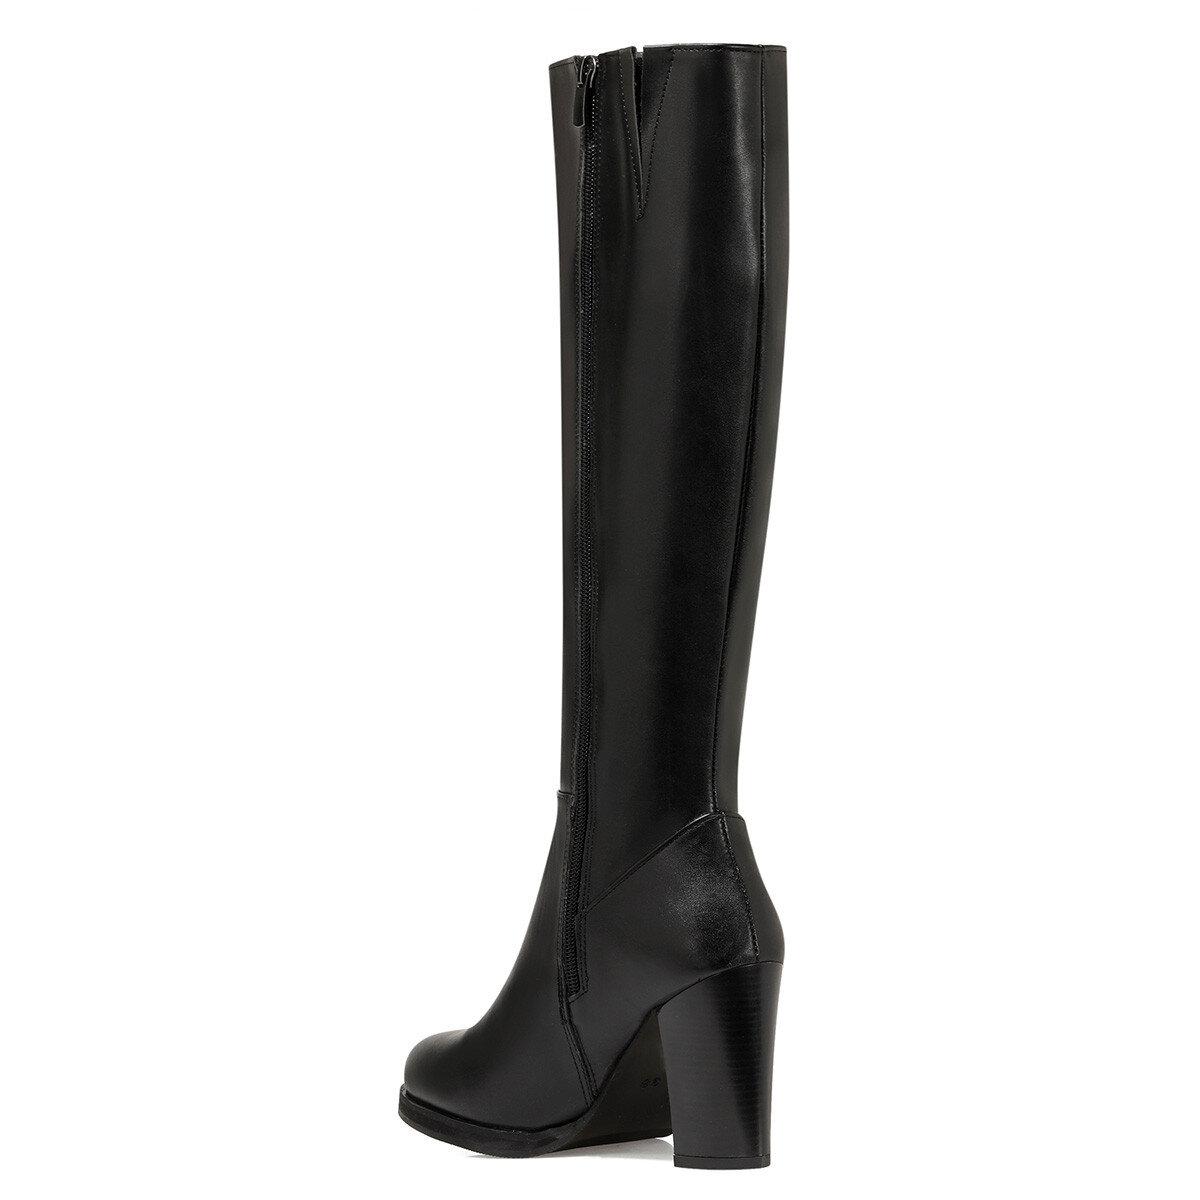 GIZMY Siyah Kadın Topuklu Çizme